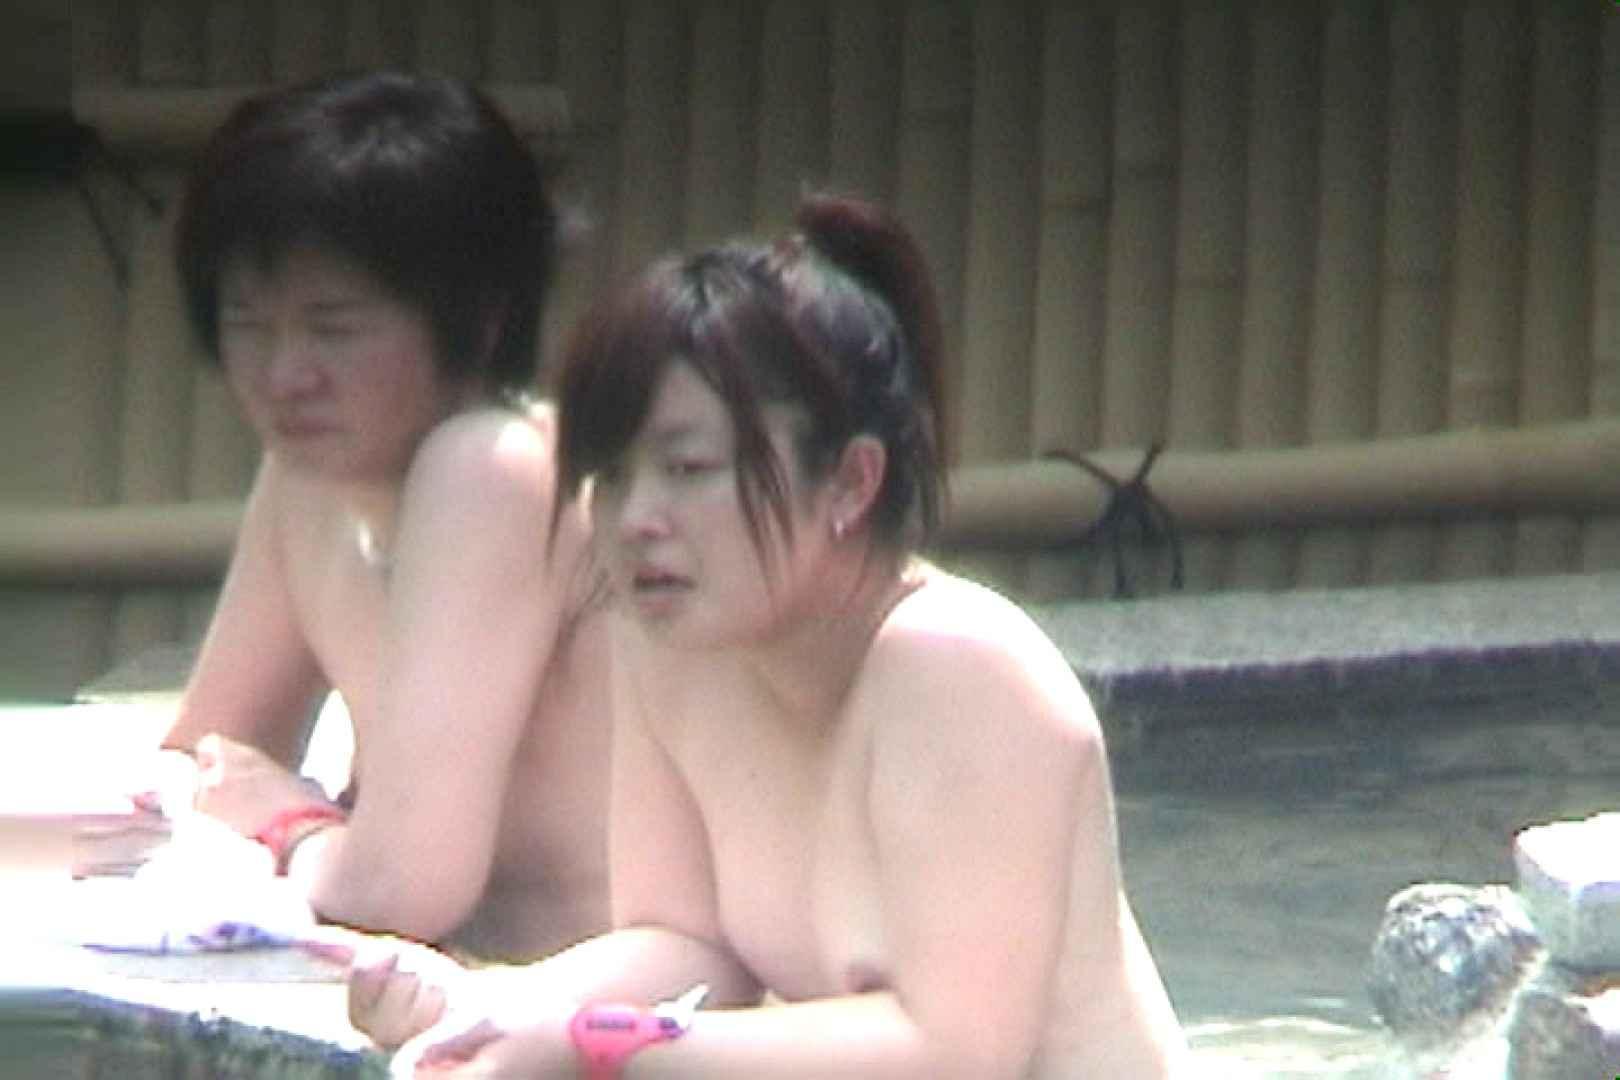 Aquaな露天風呂Vol.55【VIP限定】 綺麗なOLたち アダルト動画キャプチャ 108枚 53